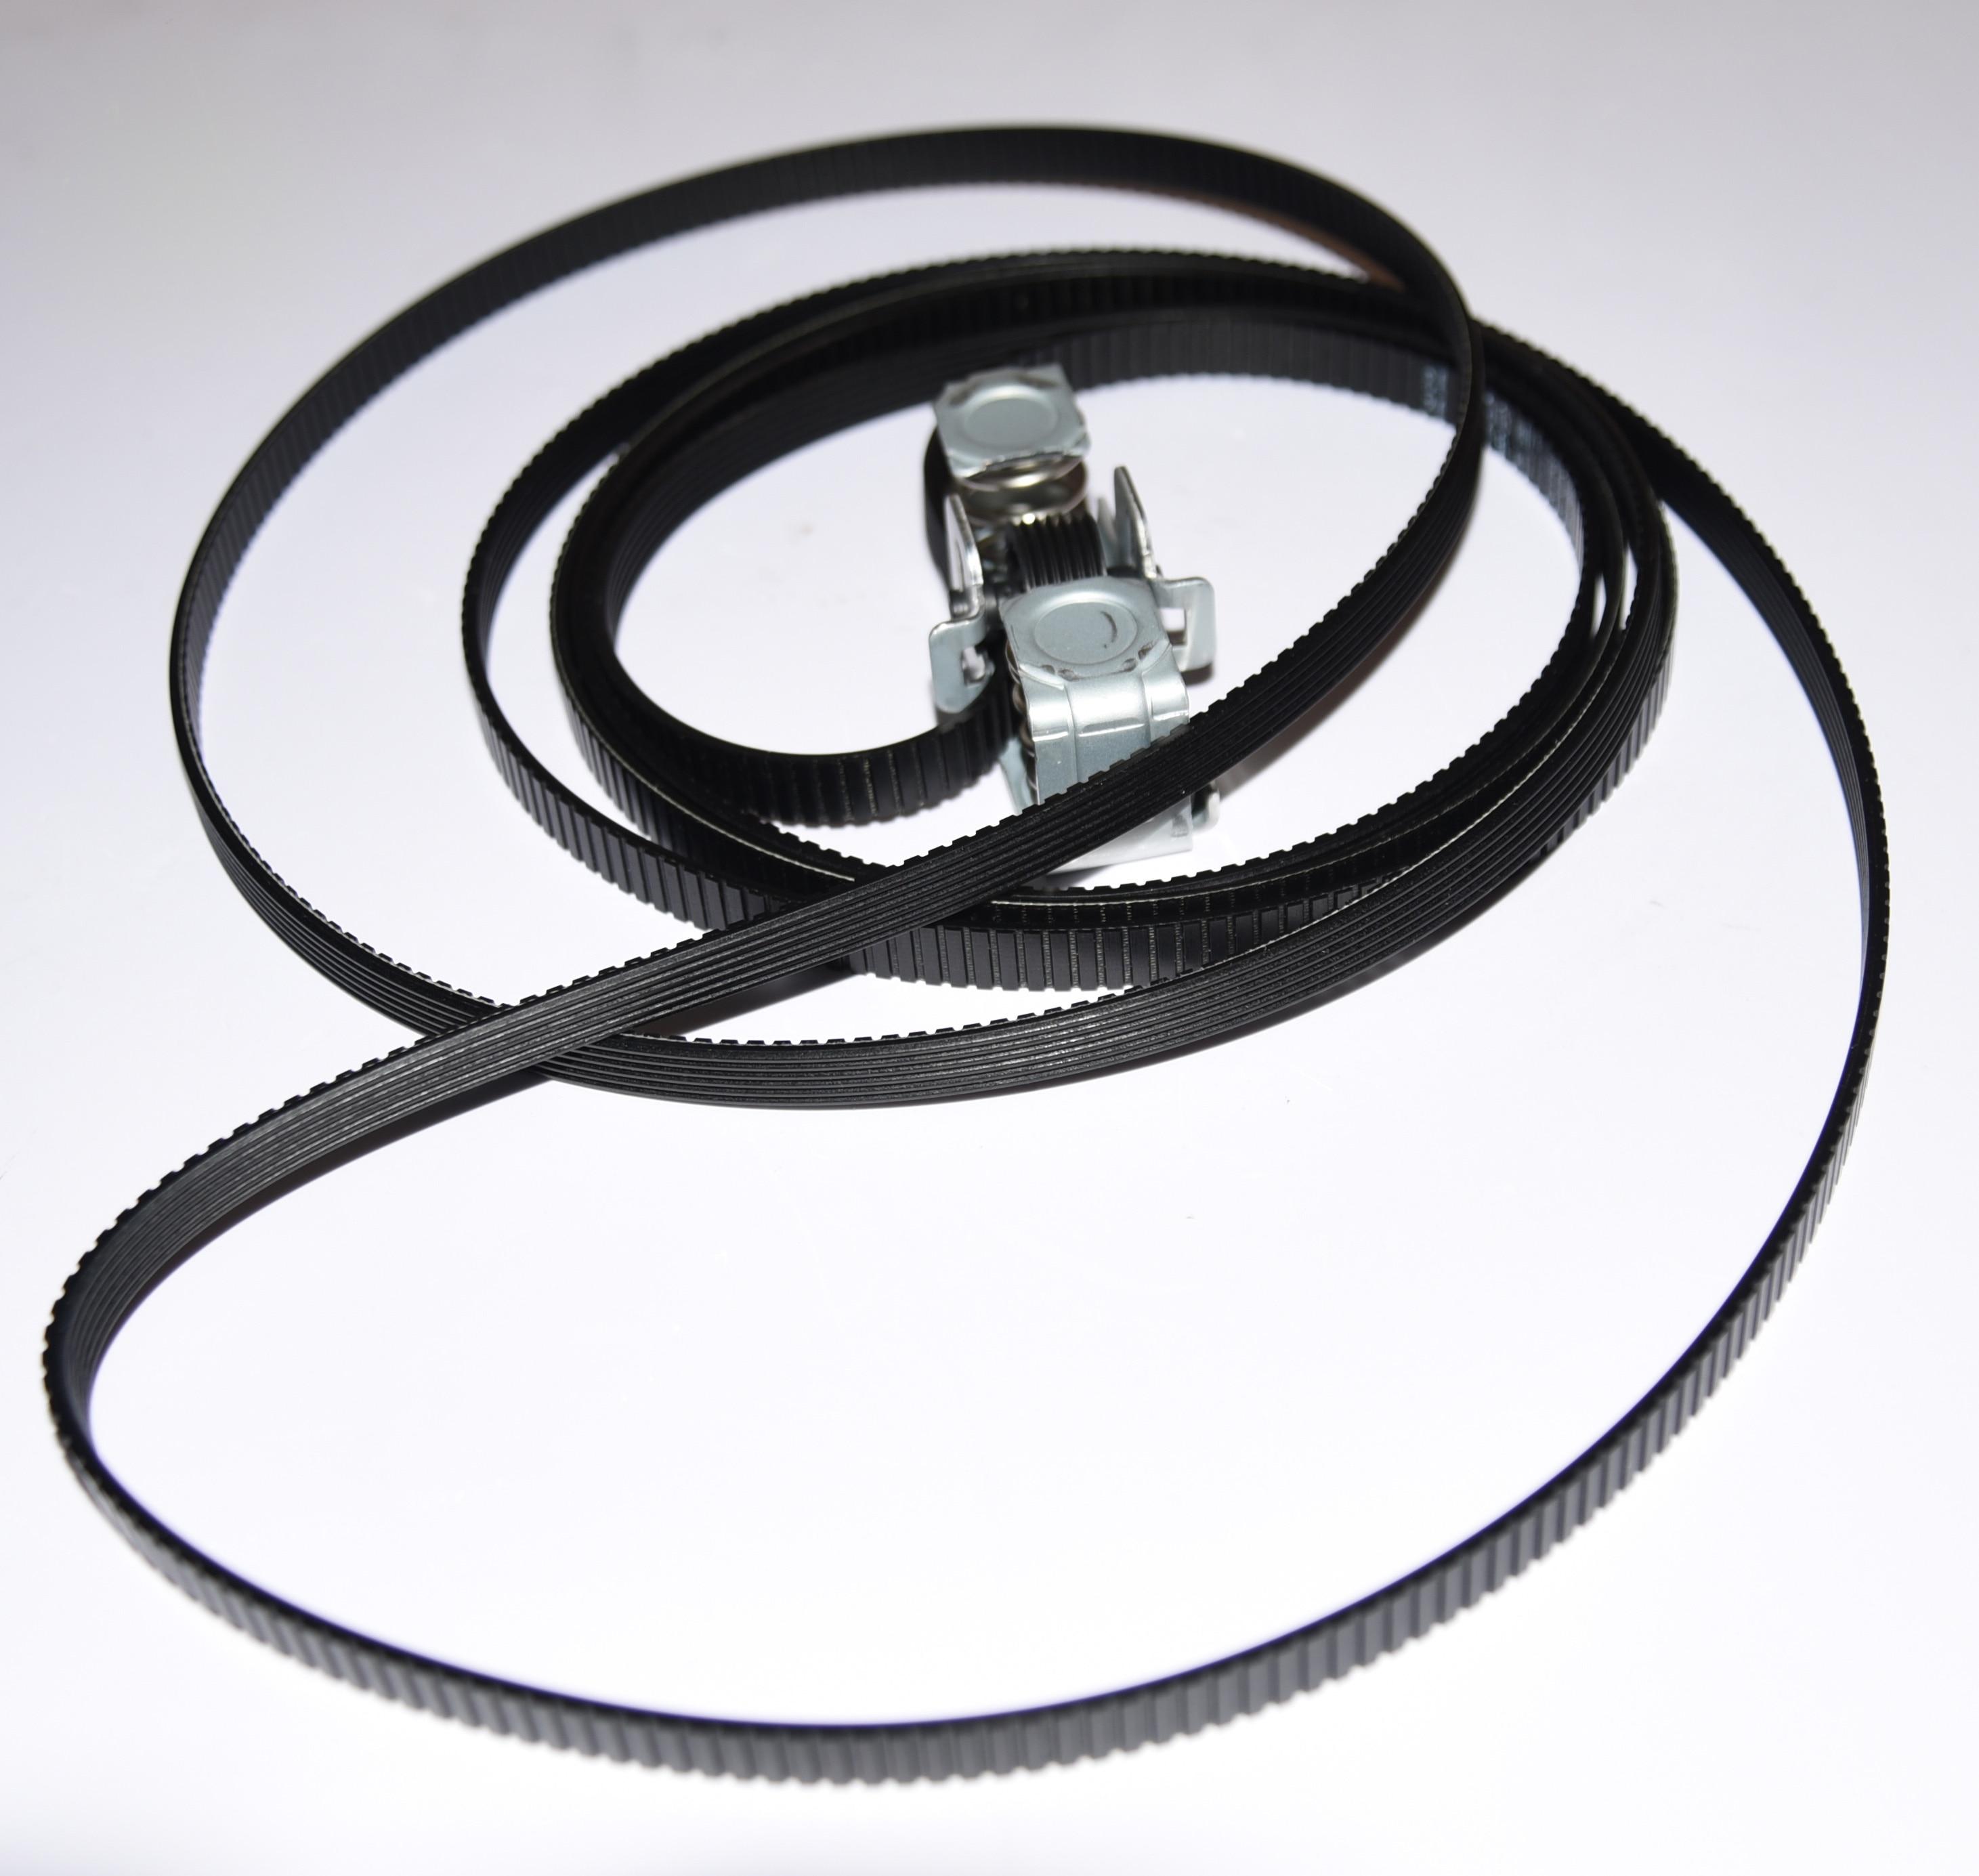 Carriage Belt For HP DesignJet T770 T790 T1200 T1300 T2300 Z5200 original